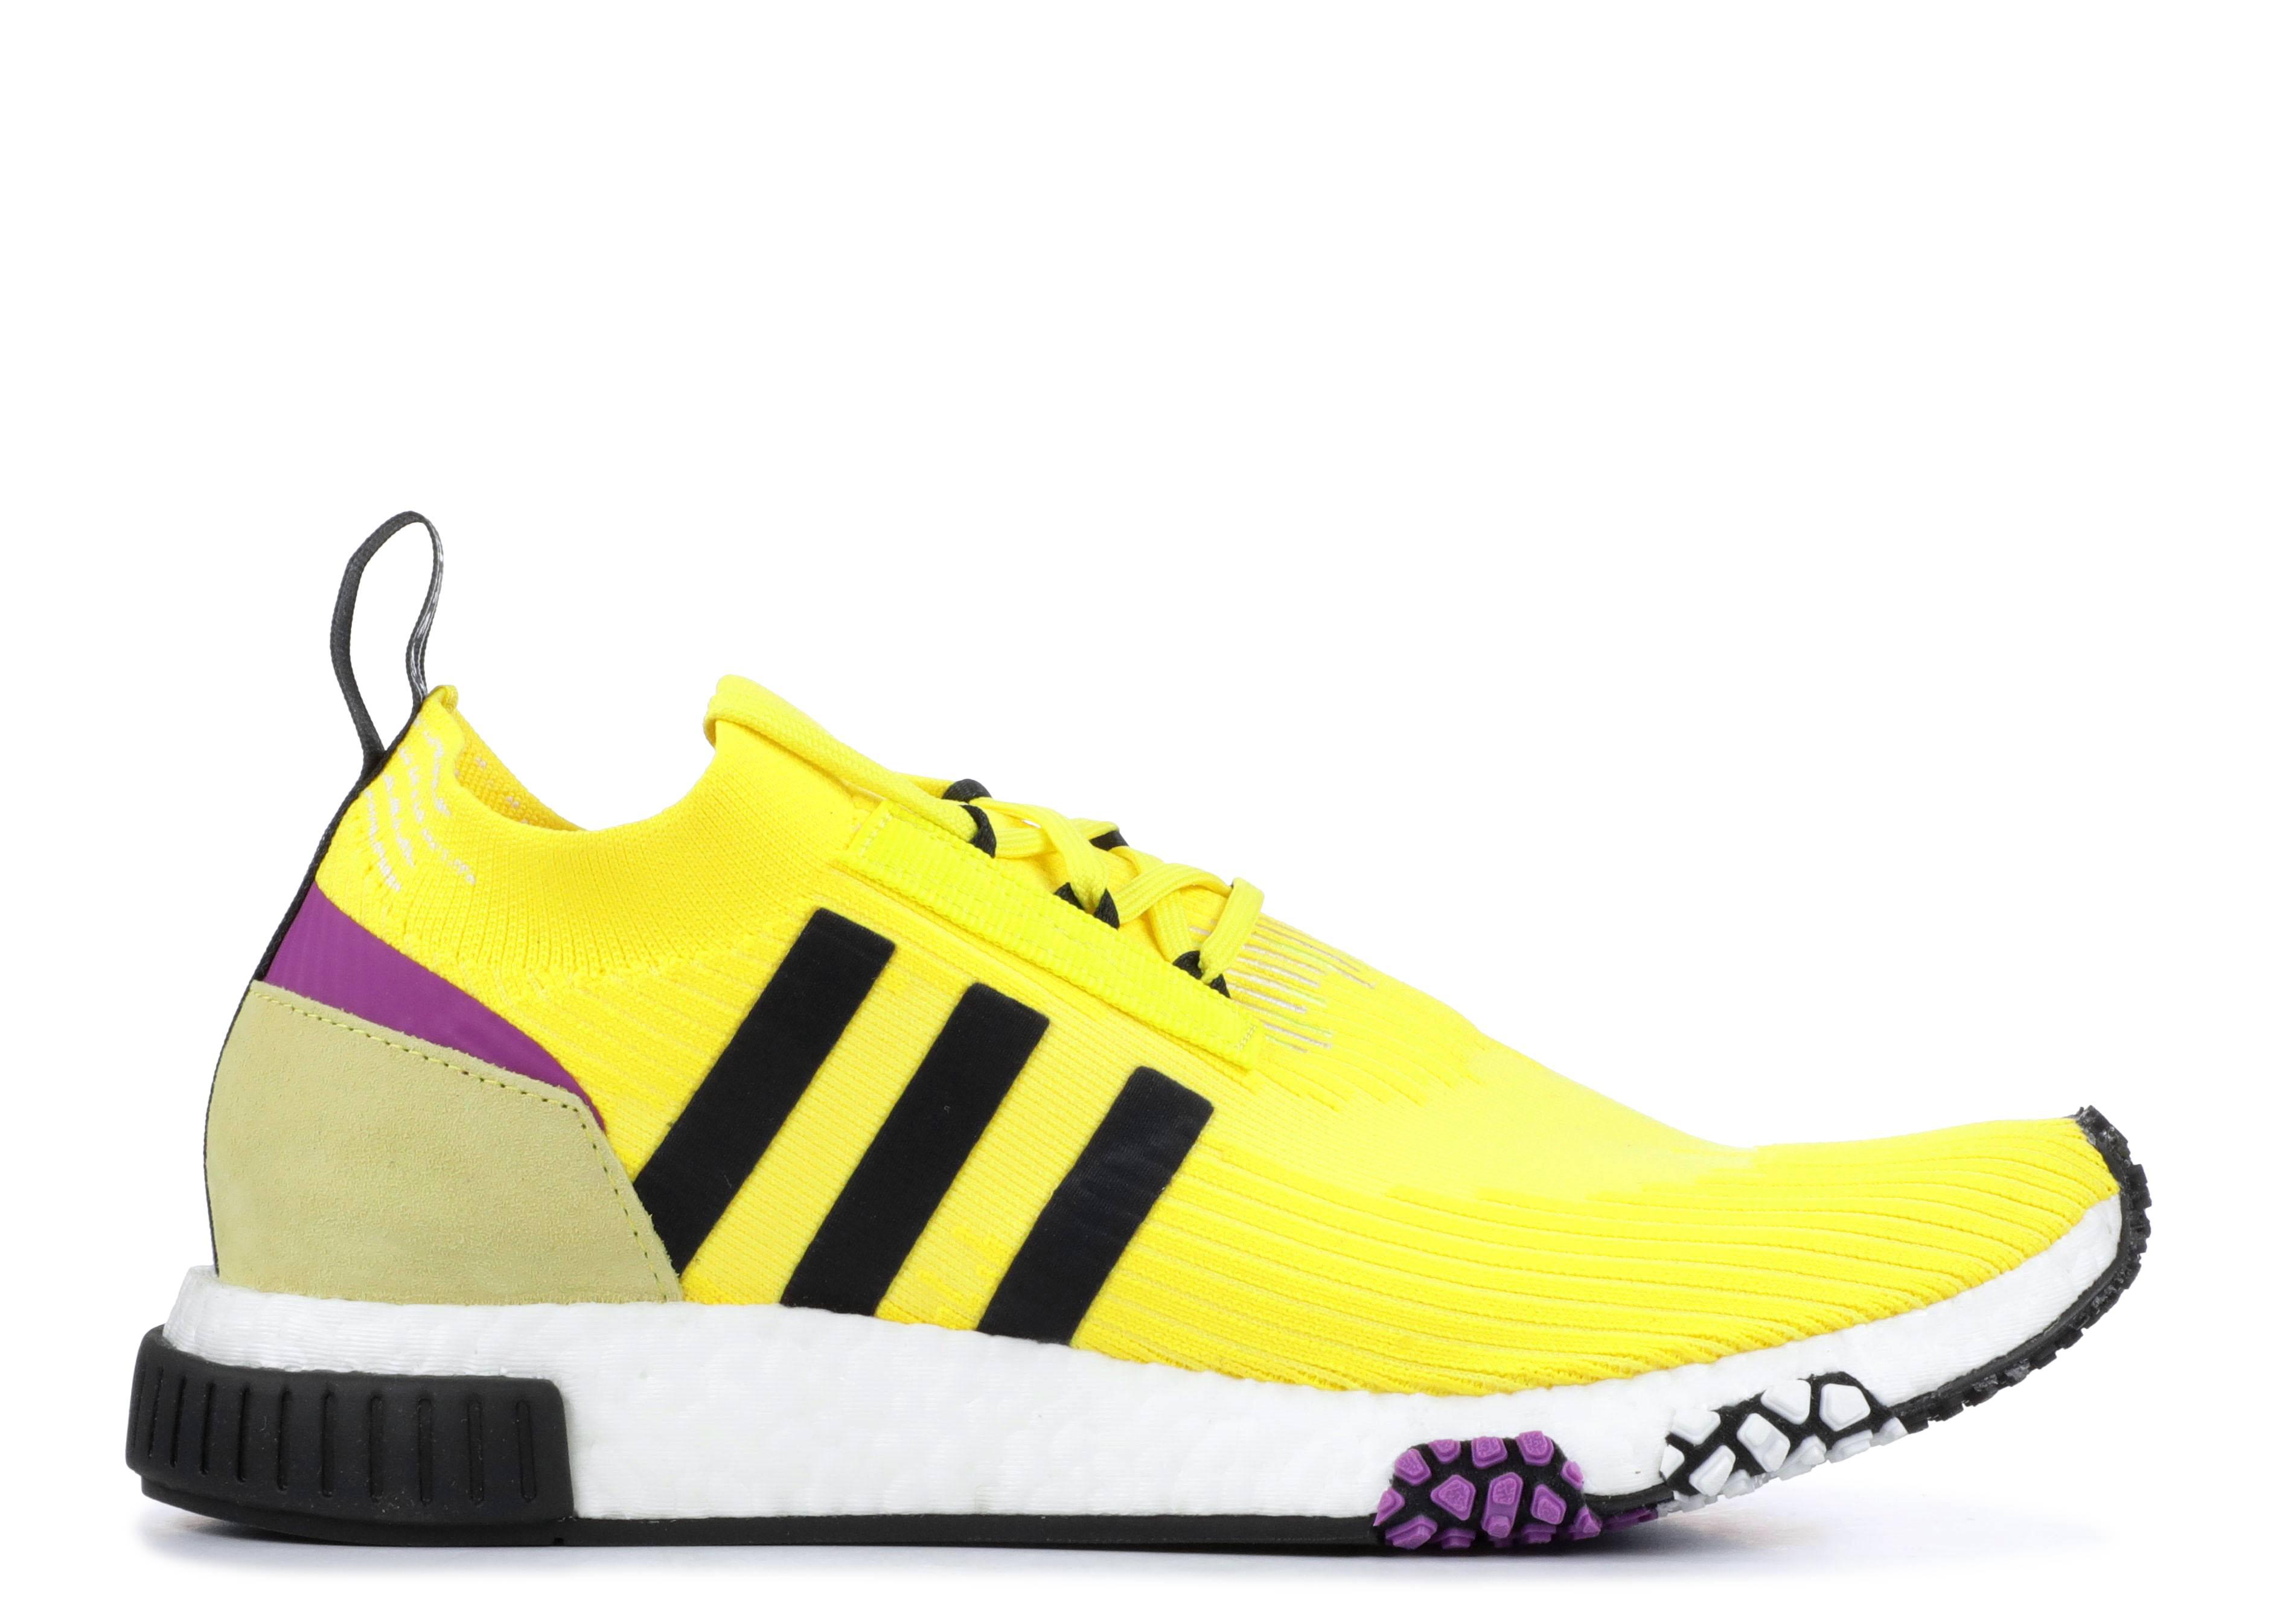 355eb882f9a1 Adidas Nmd Racer Primeknit Shoes - Adidas - b37641 - solar yellow core black  shock purple